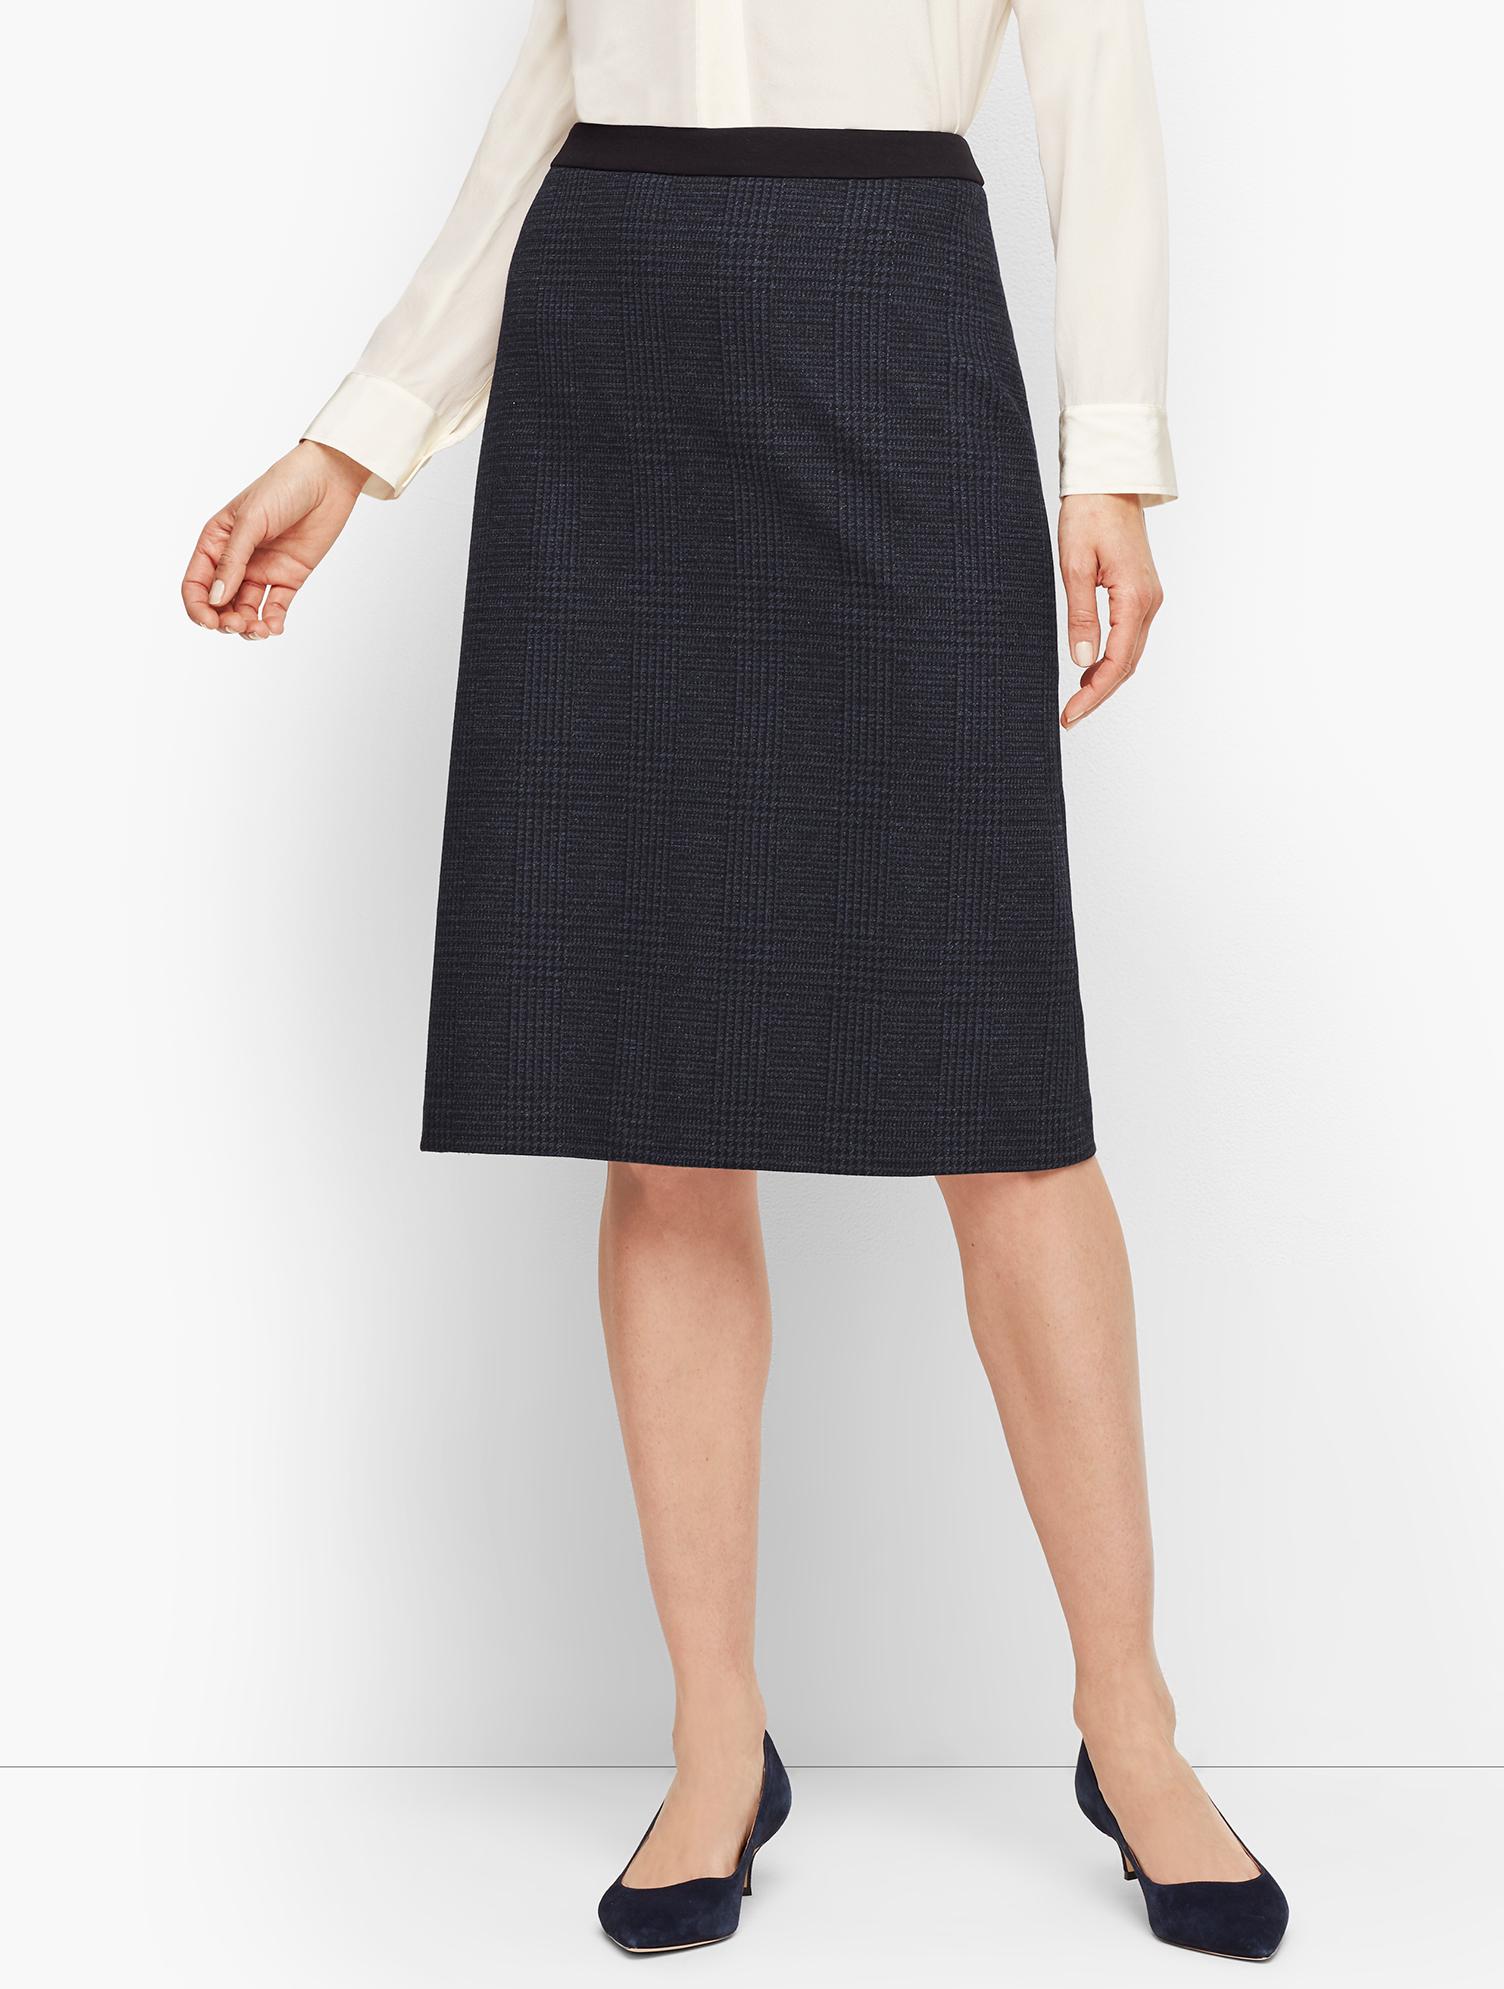 60s Skirts | 70s Hippie Skirts, Jumper Dresses Luxe Knit Plaid A-line Skirt - NAVYBLACK - 16 - Talbots $104.25 AT vintagedancer.com